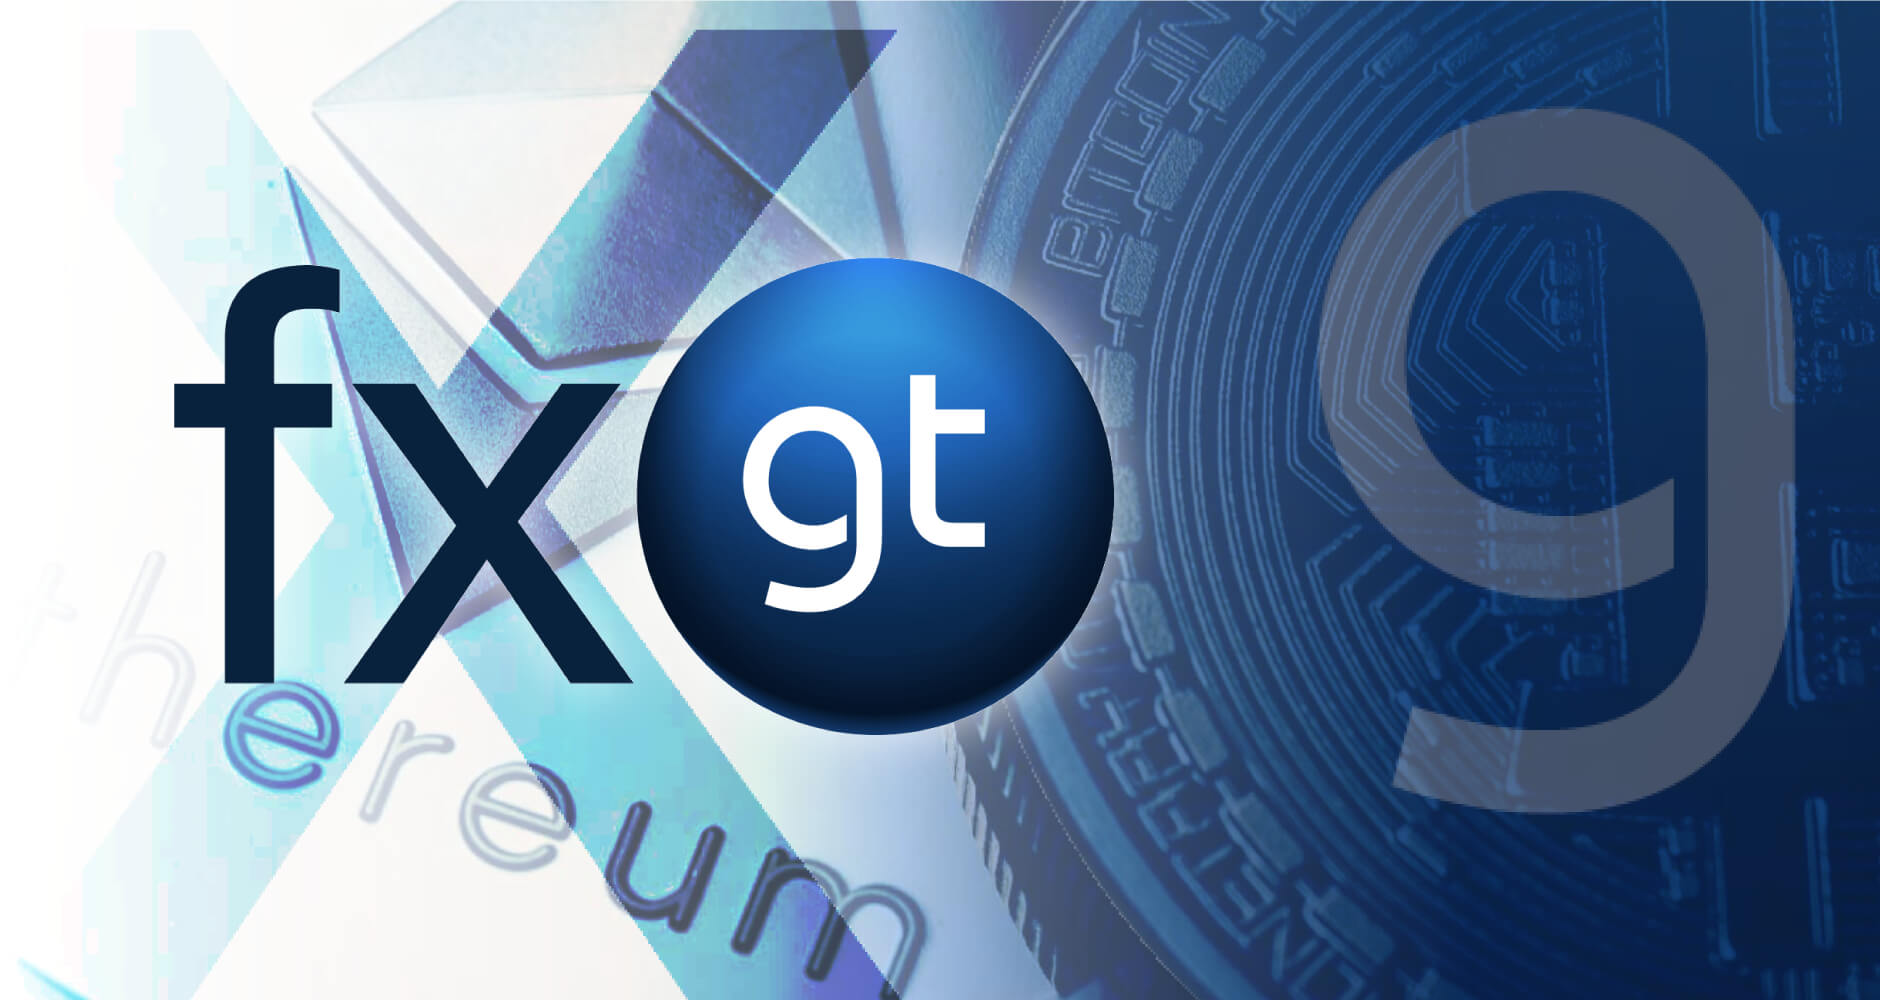 FXGTはFX・仮想通貨の両方が同時に取引可能な新しい海外FX業者